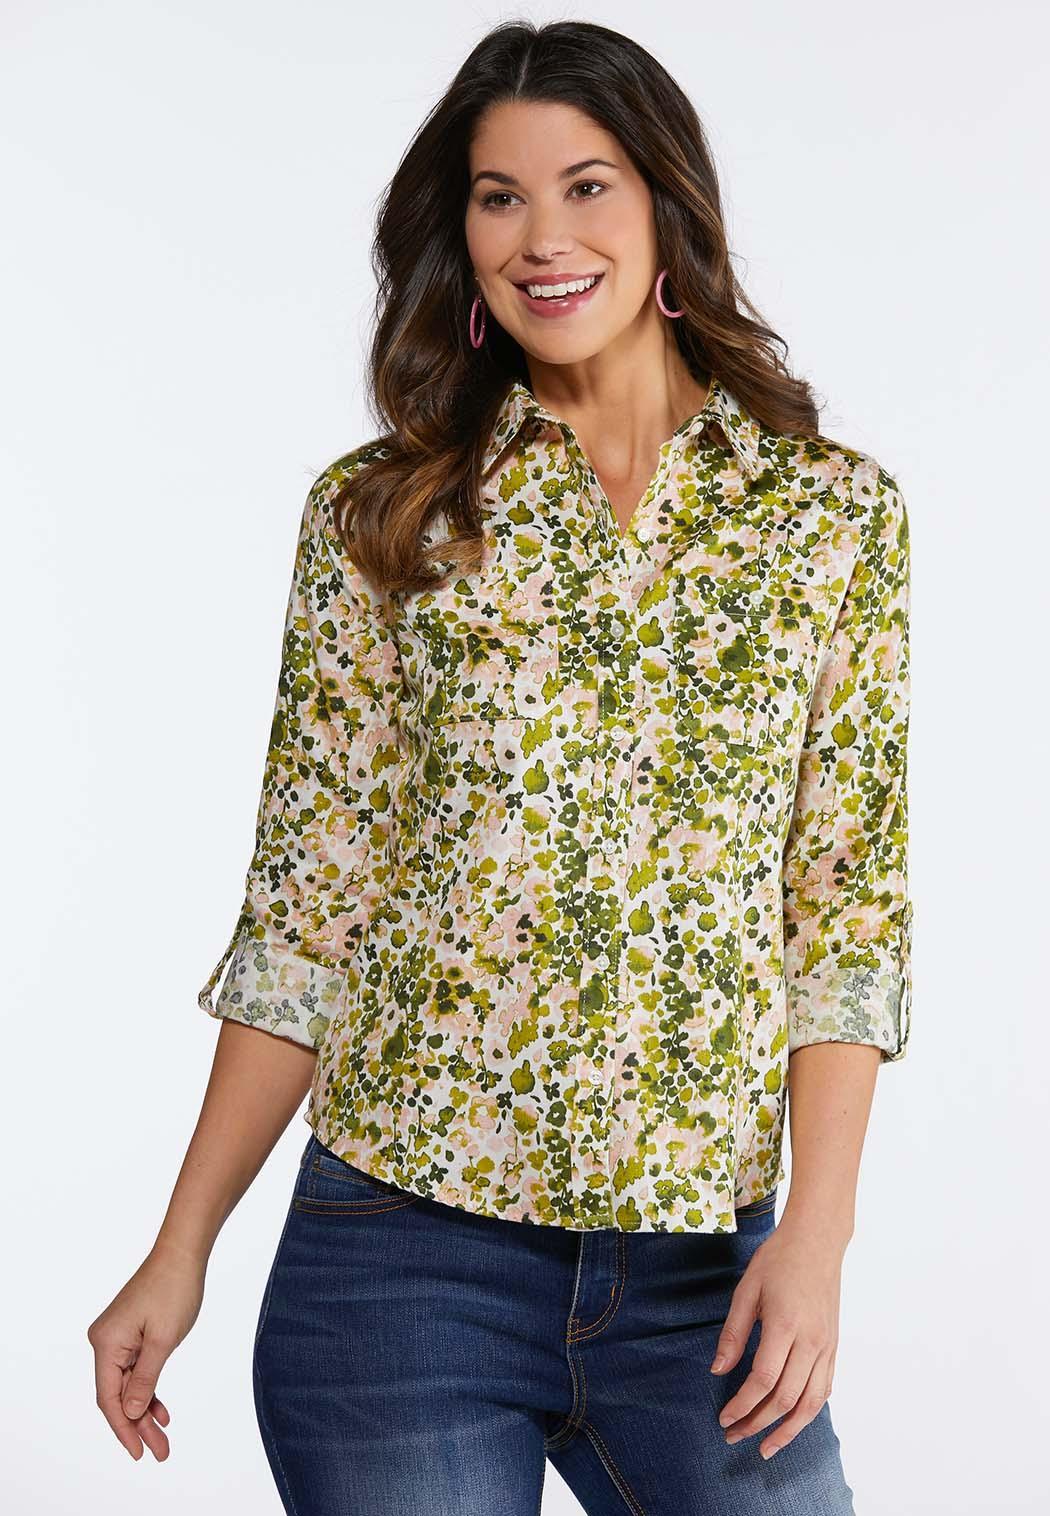 Plus Size Primrose Printed Top Shirts Blouses Cato Fashions